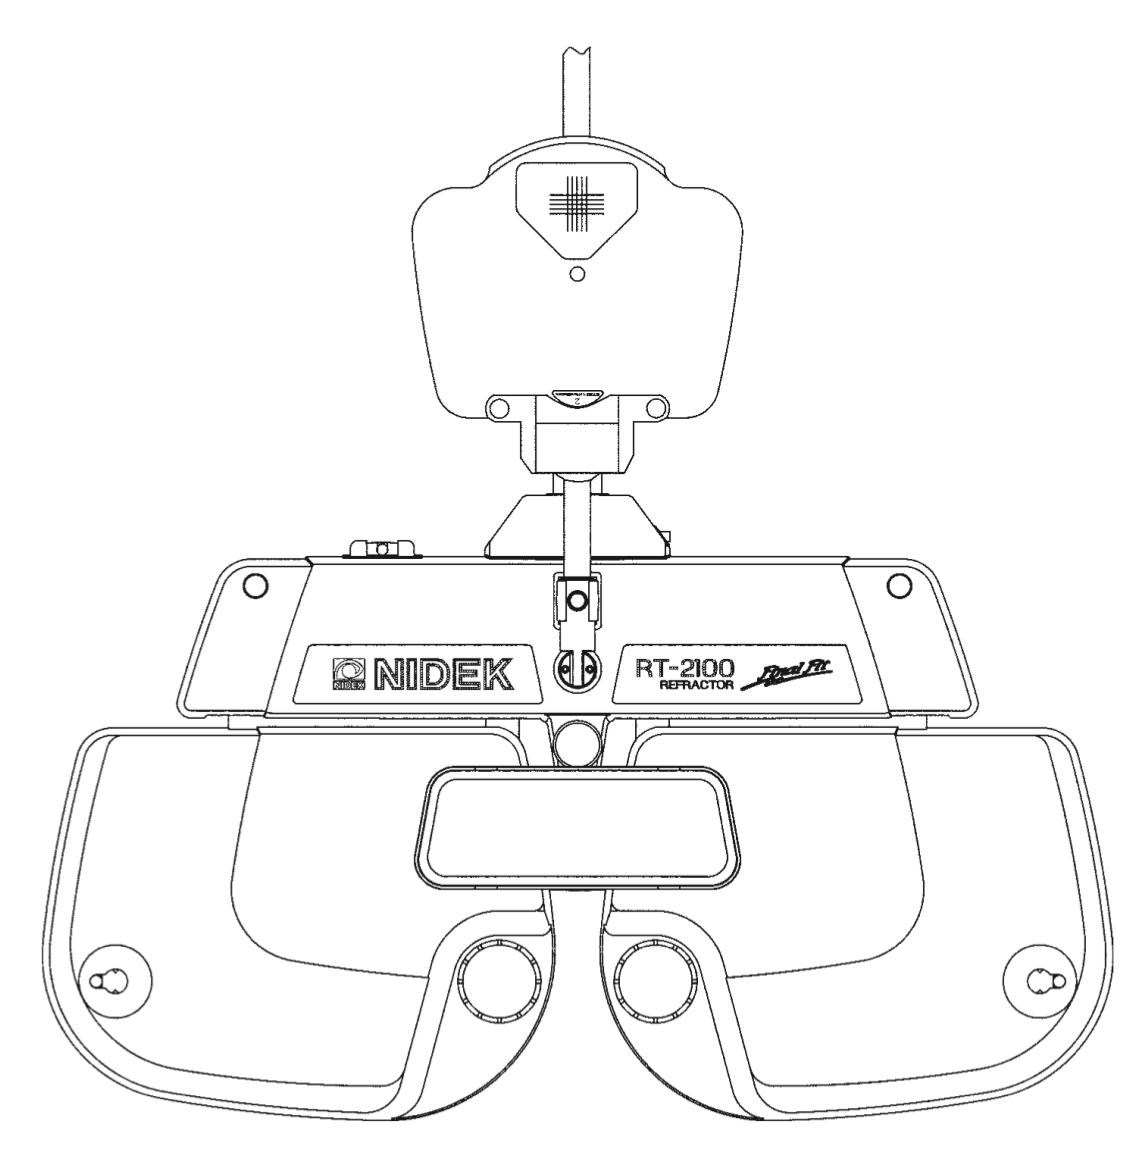 RT 2100 Digital Phoropter